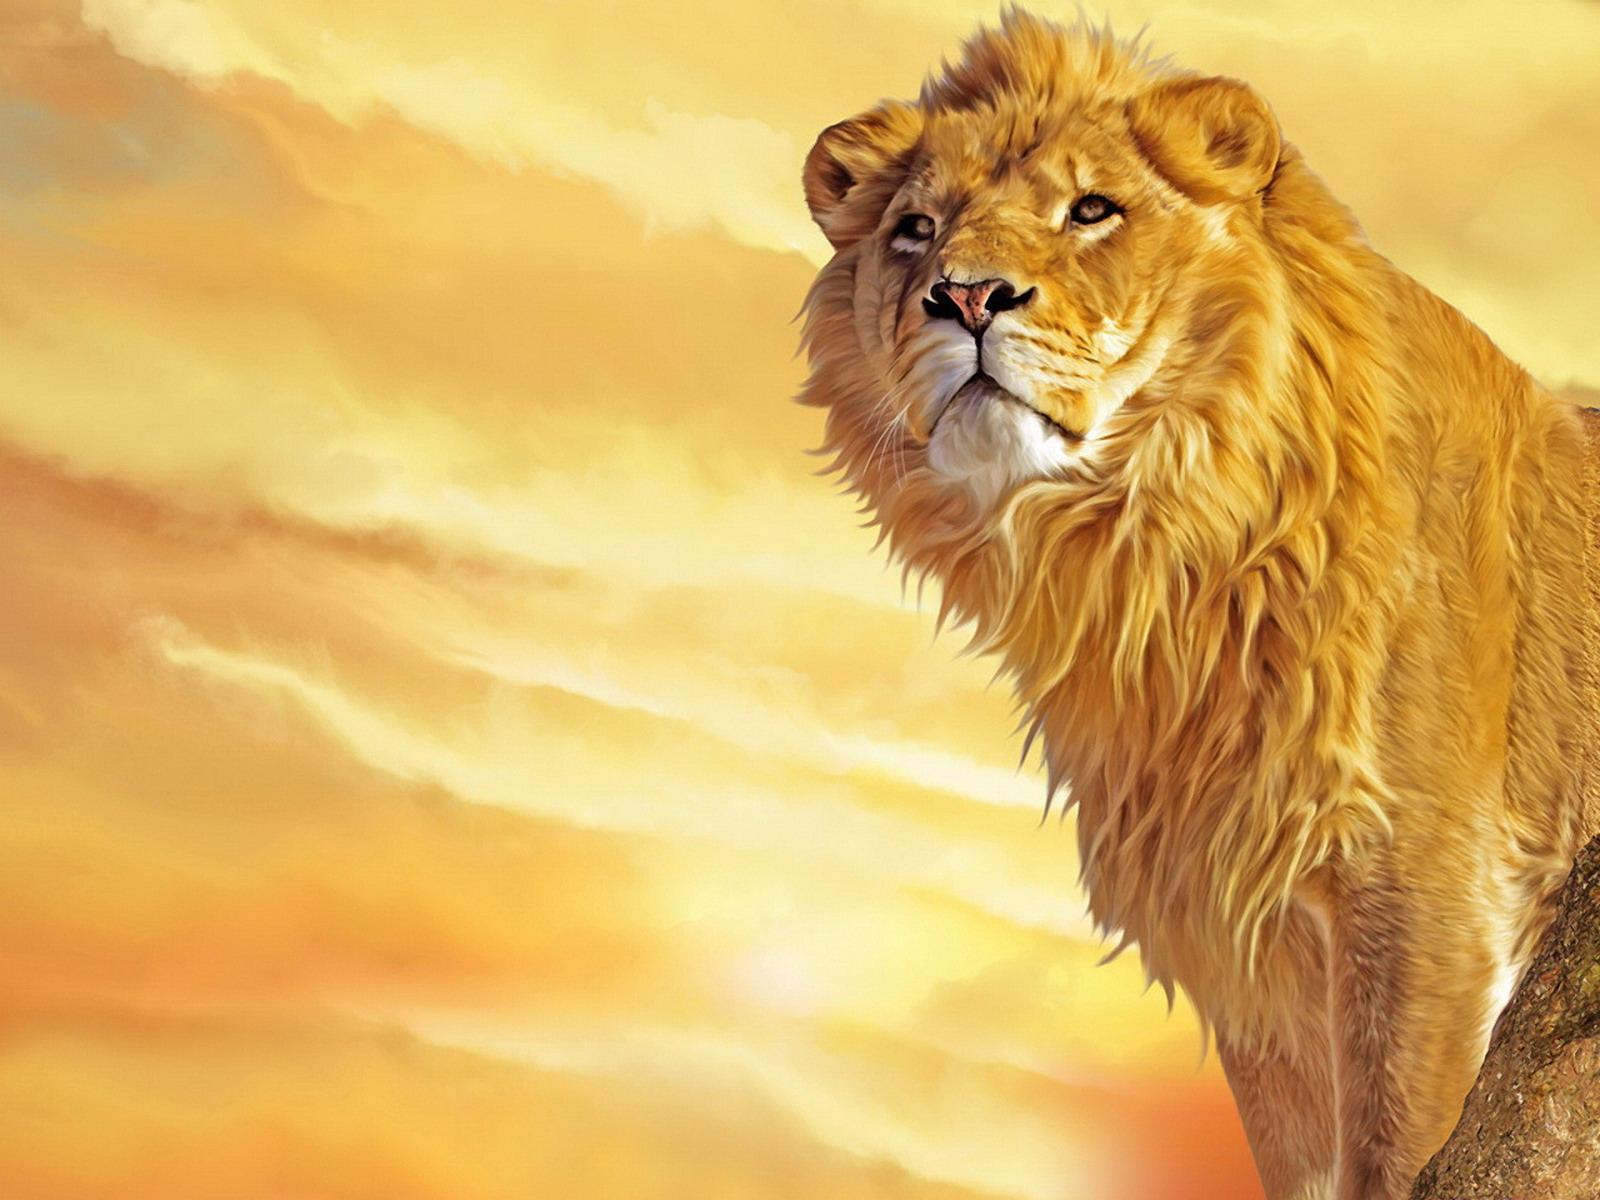 lion painting wallpaper 1600x1200